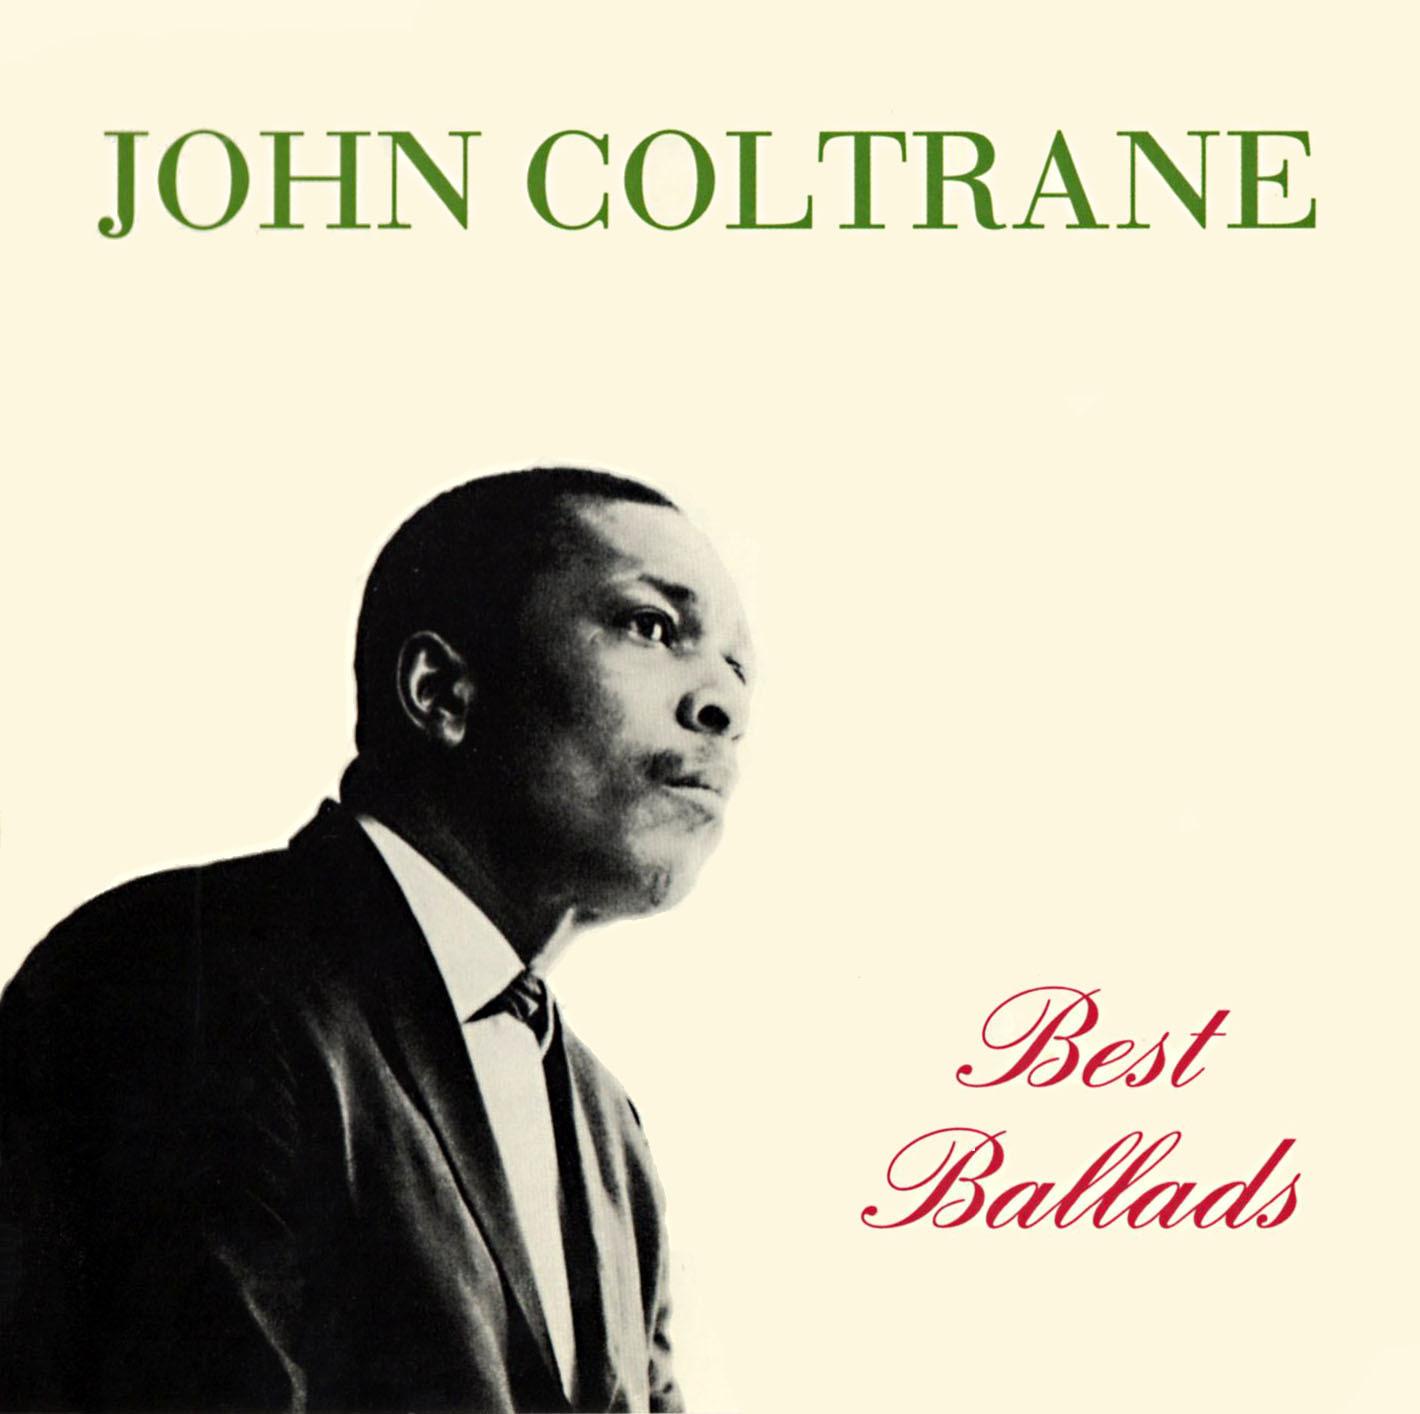 John Coltrane (ジョン・コルトレーン) 『Best Ballads (ベスト・バラード)』(1994年発売) 高画質ジャケ写